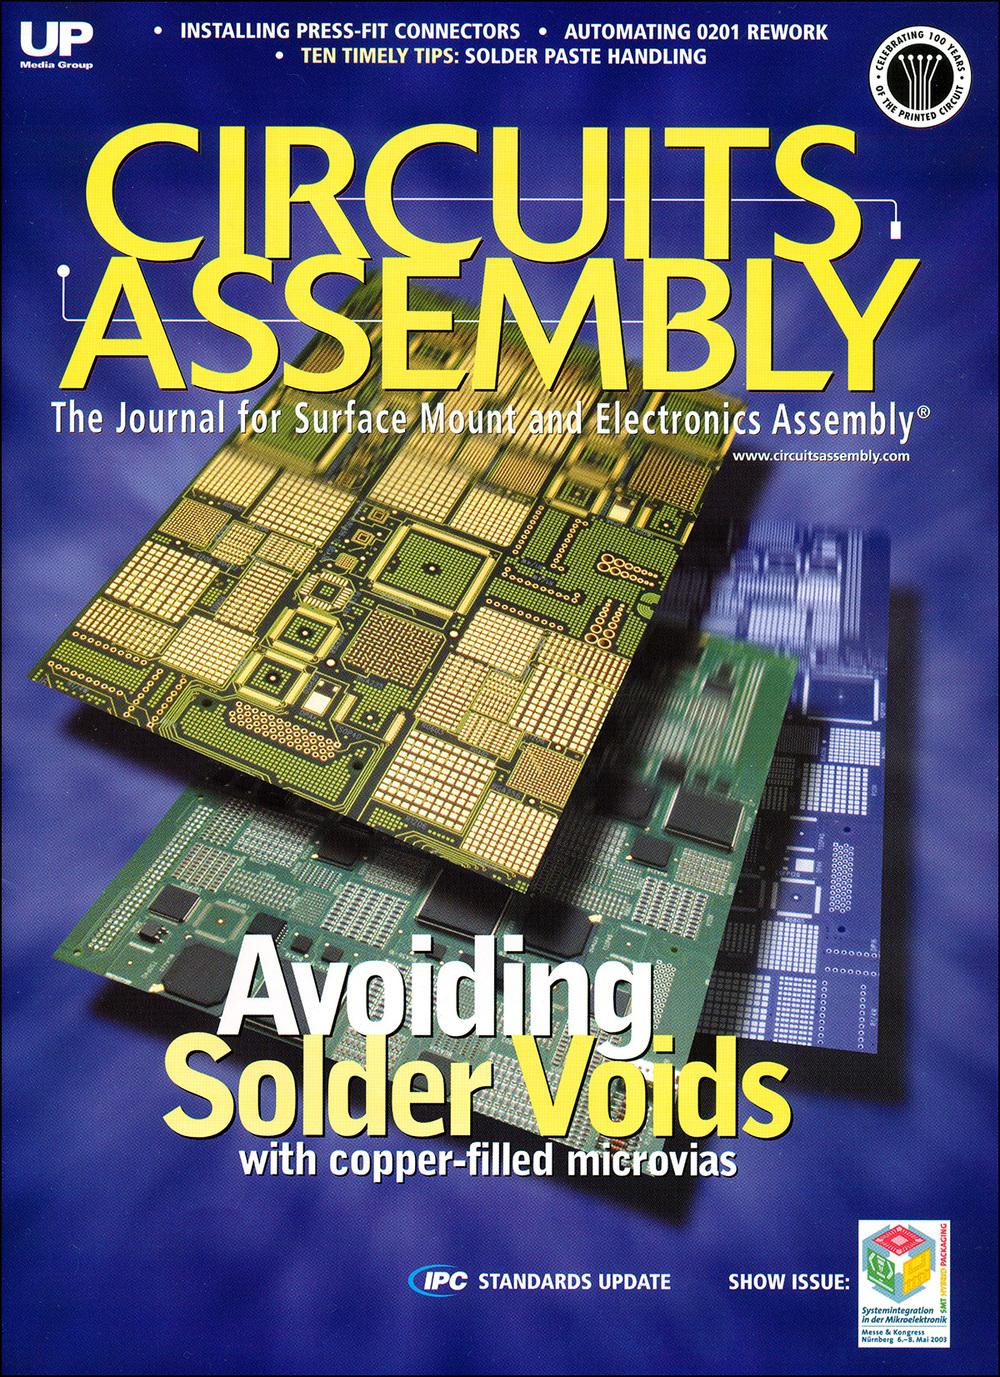 CA cover web.jpg